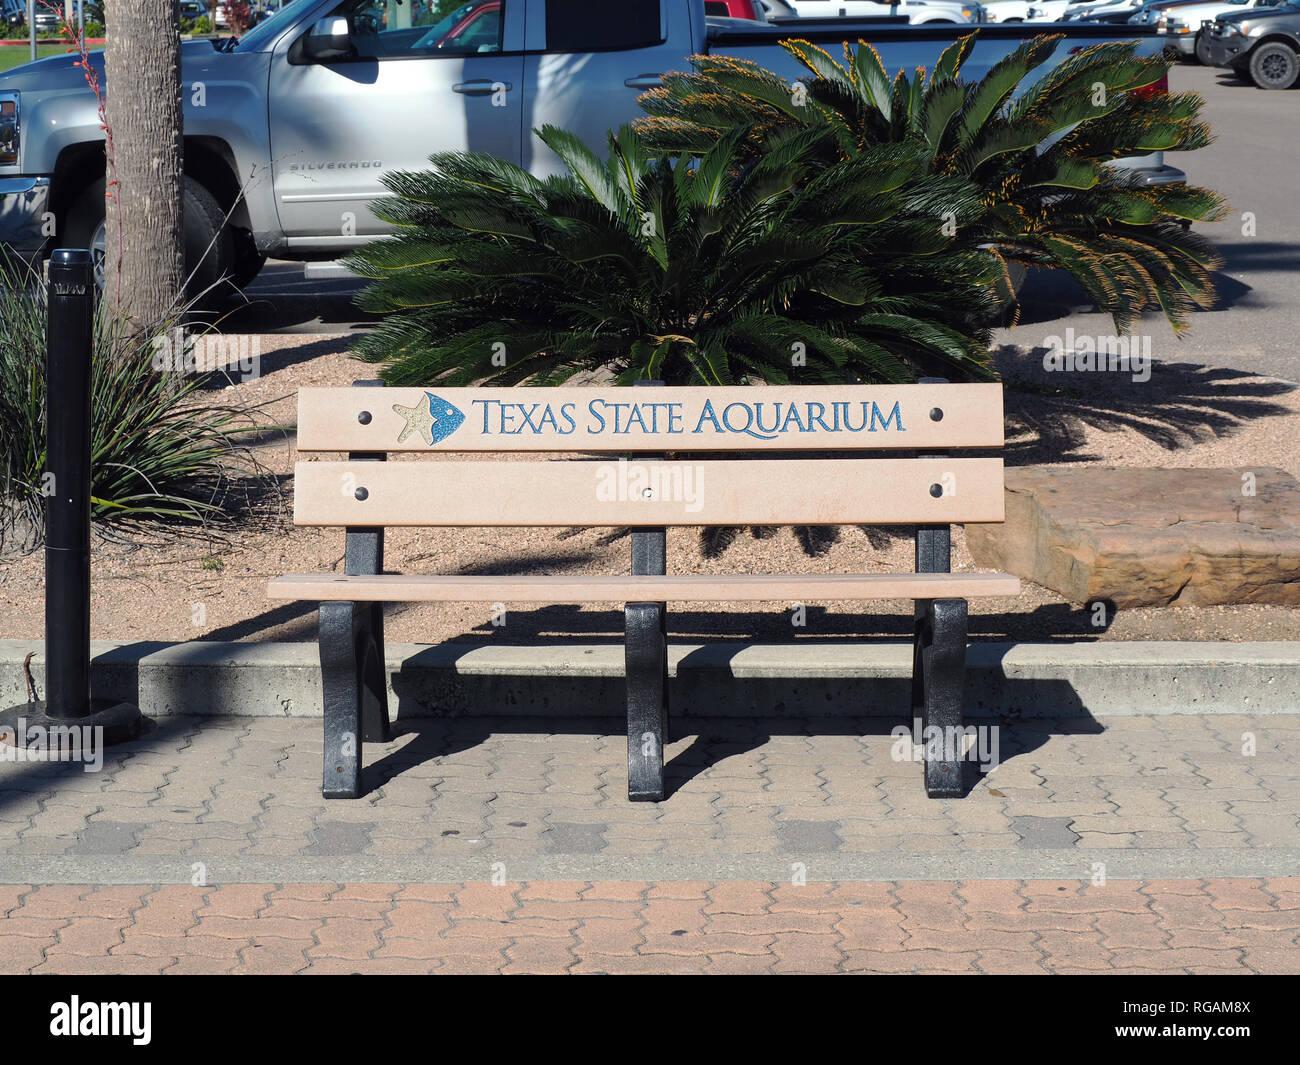 A bench with the Texas State Aquarium logo on the aquarium property in Corpus Christi Texas USA. Stock Photo